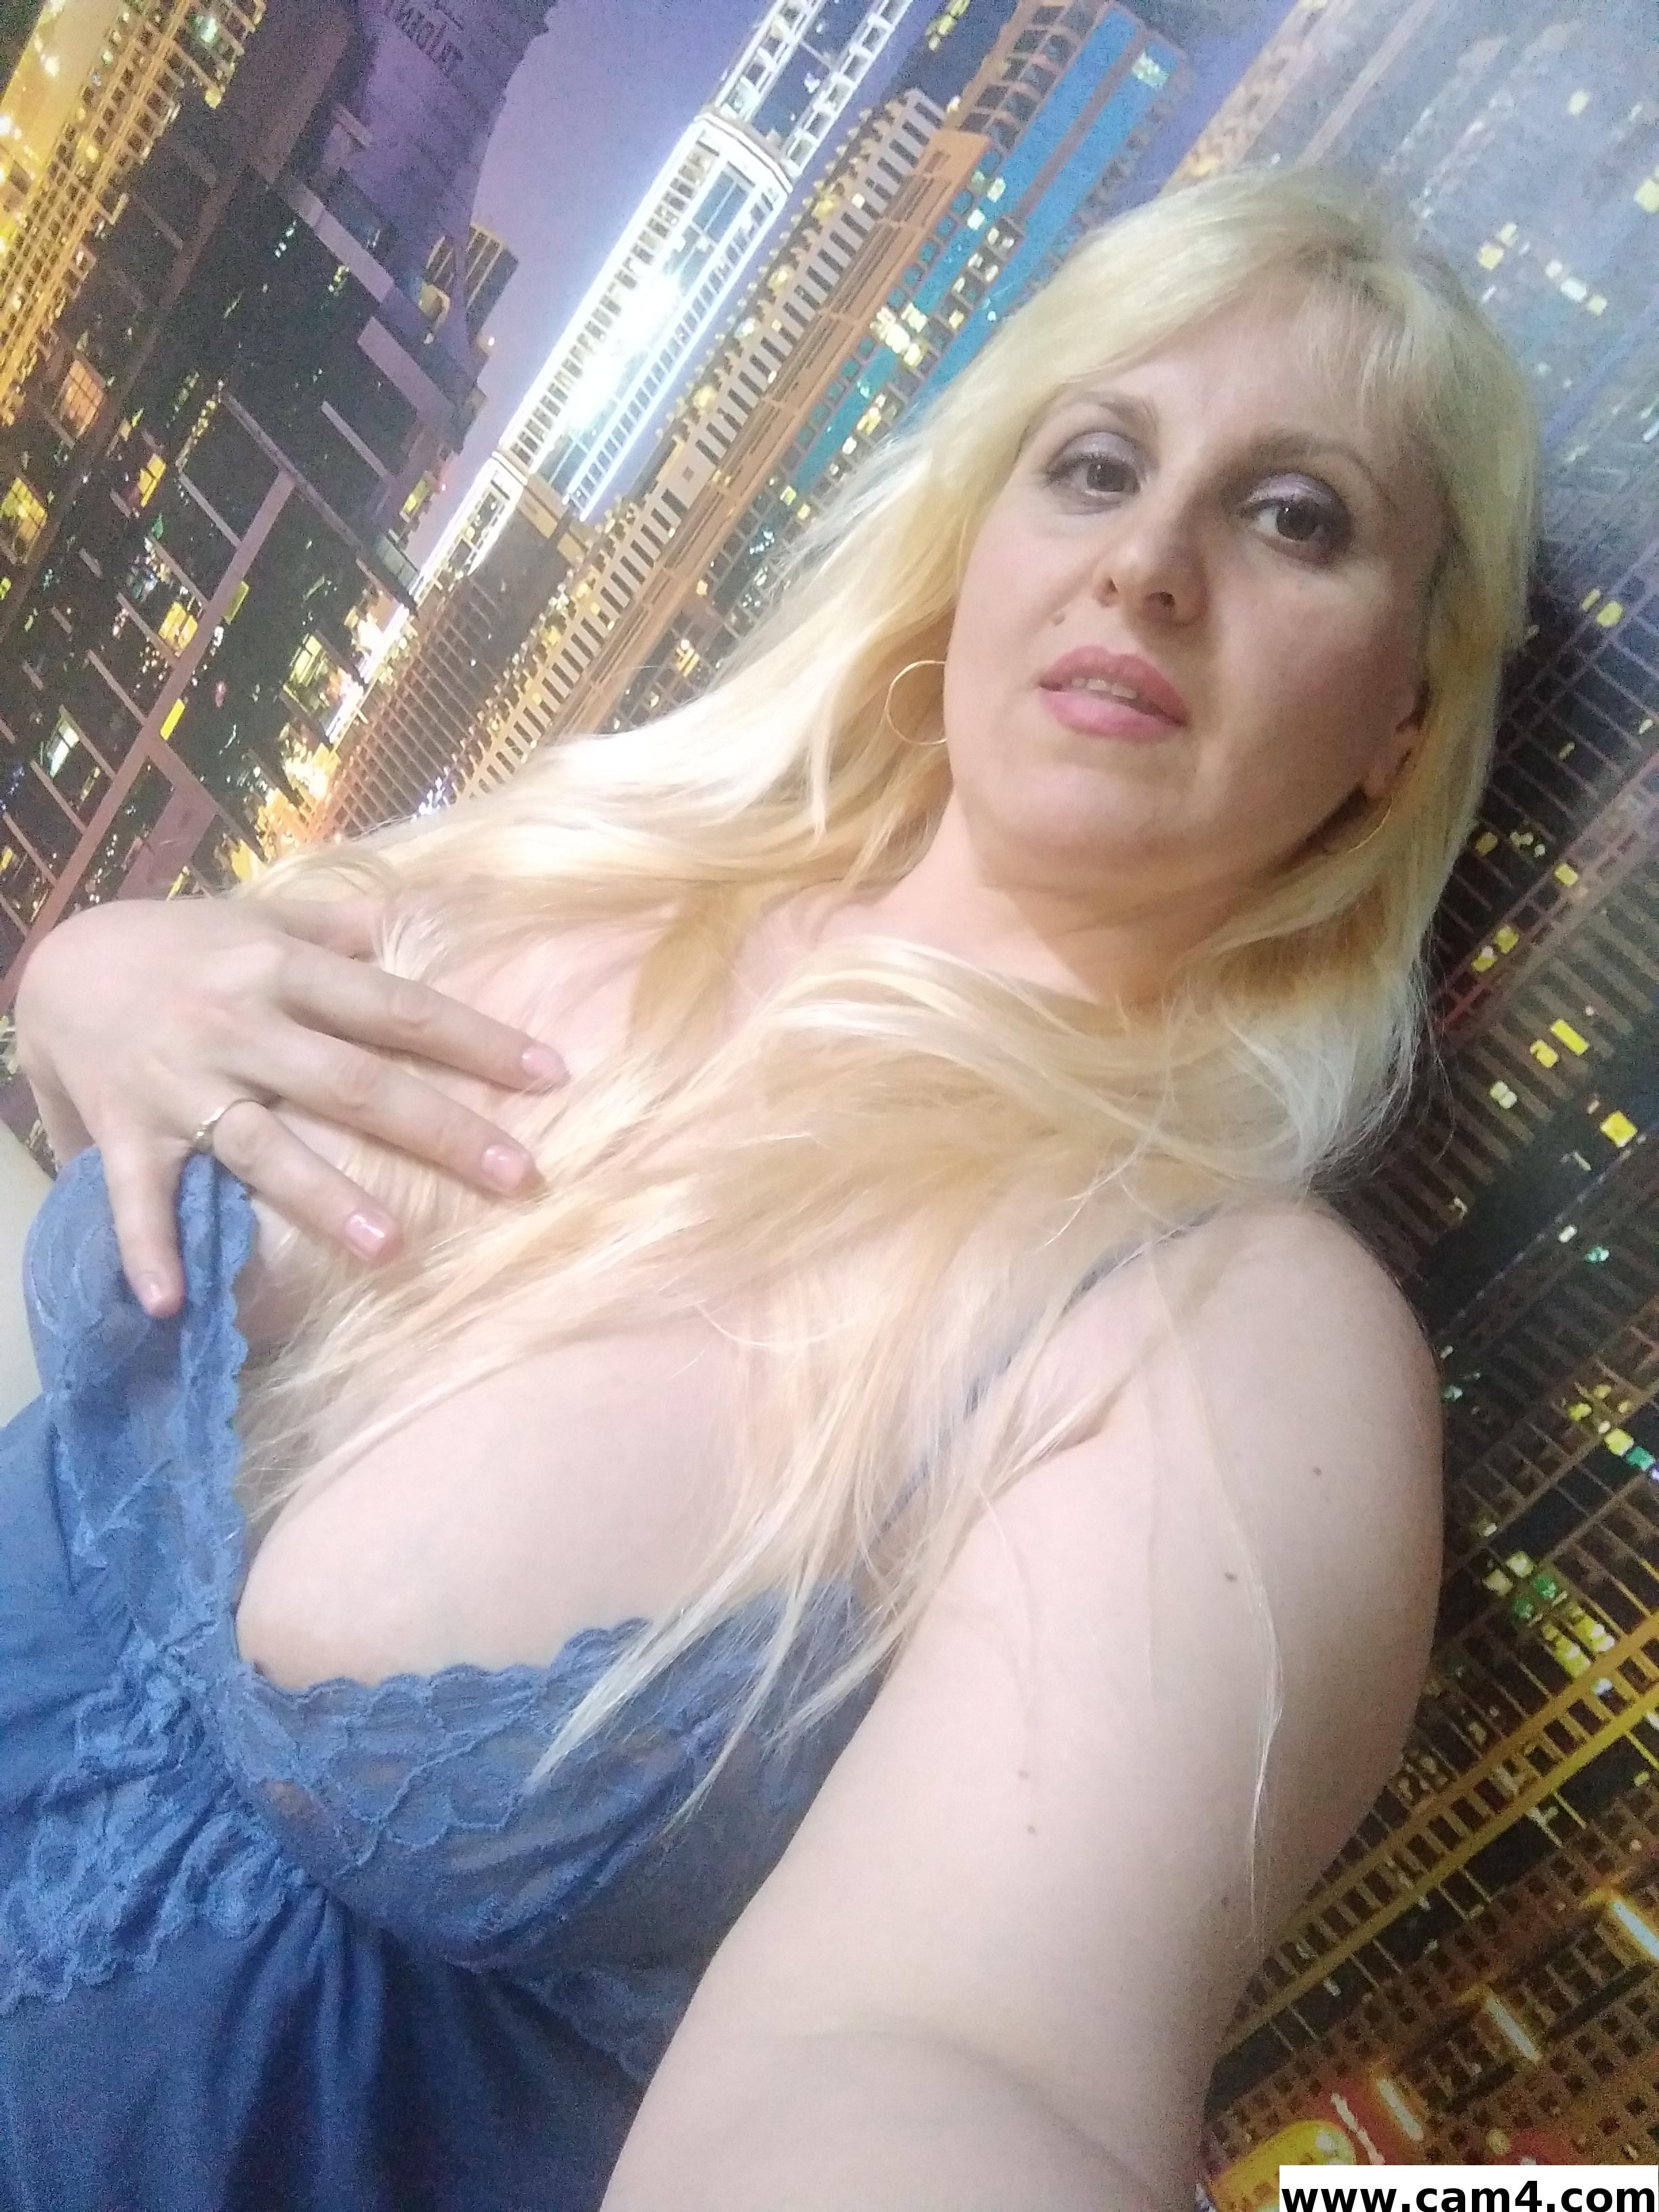 Blondabella?s=nuk8grzqwkmjqeqydkhz86myamhnpesqjhpaq3yqvz0=